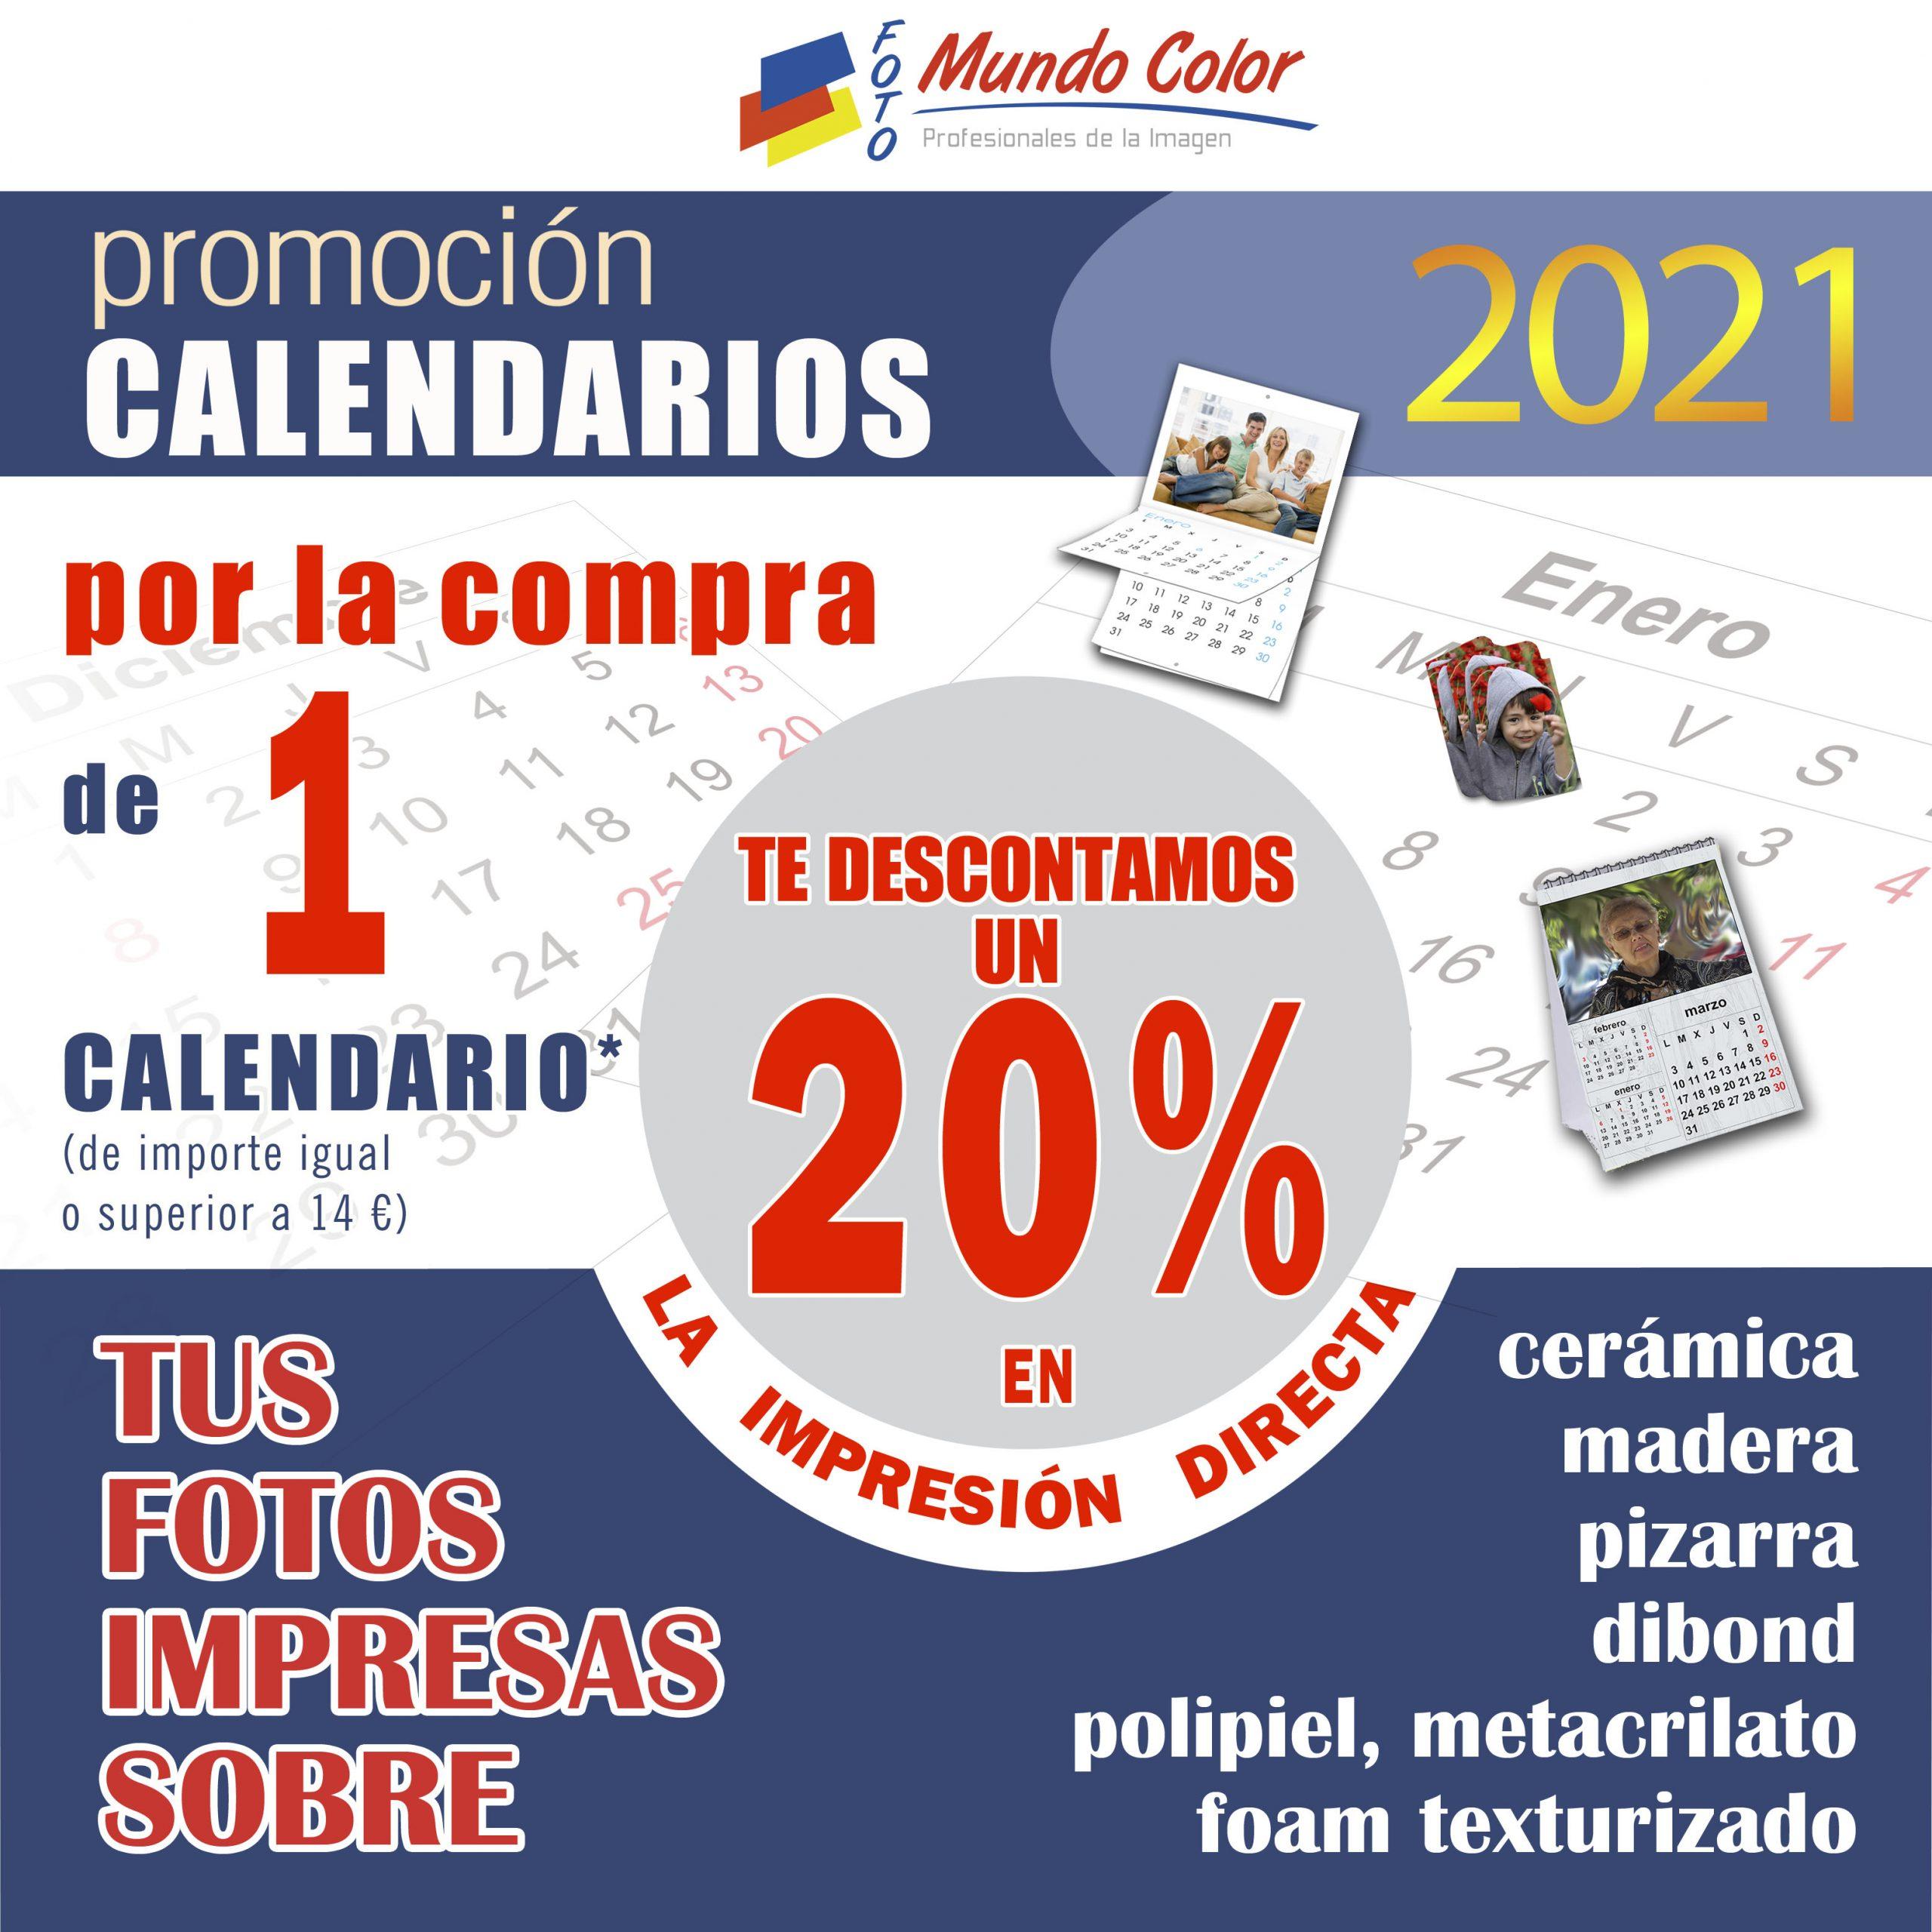 Promoción calendarios personalizados 2021